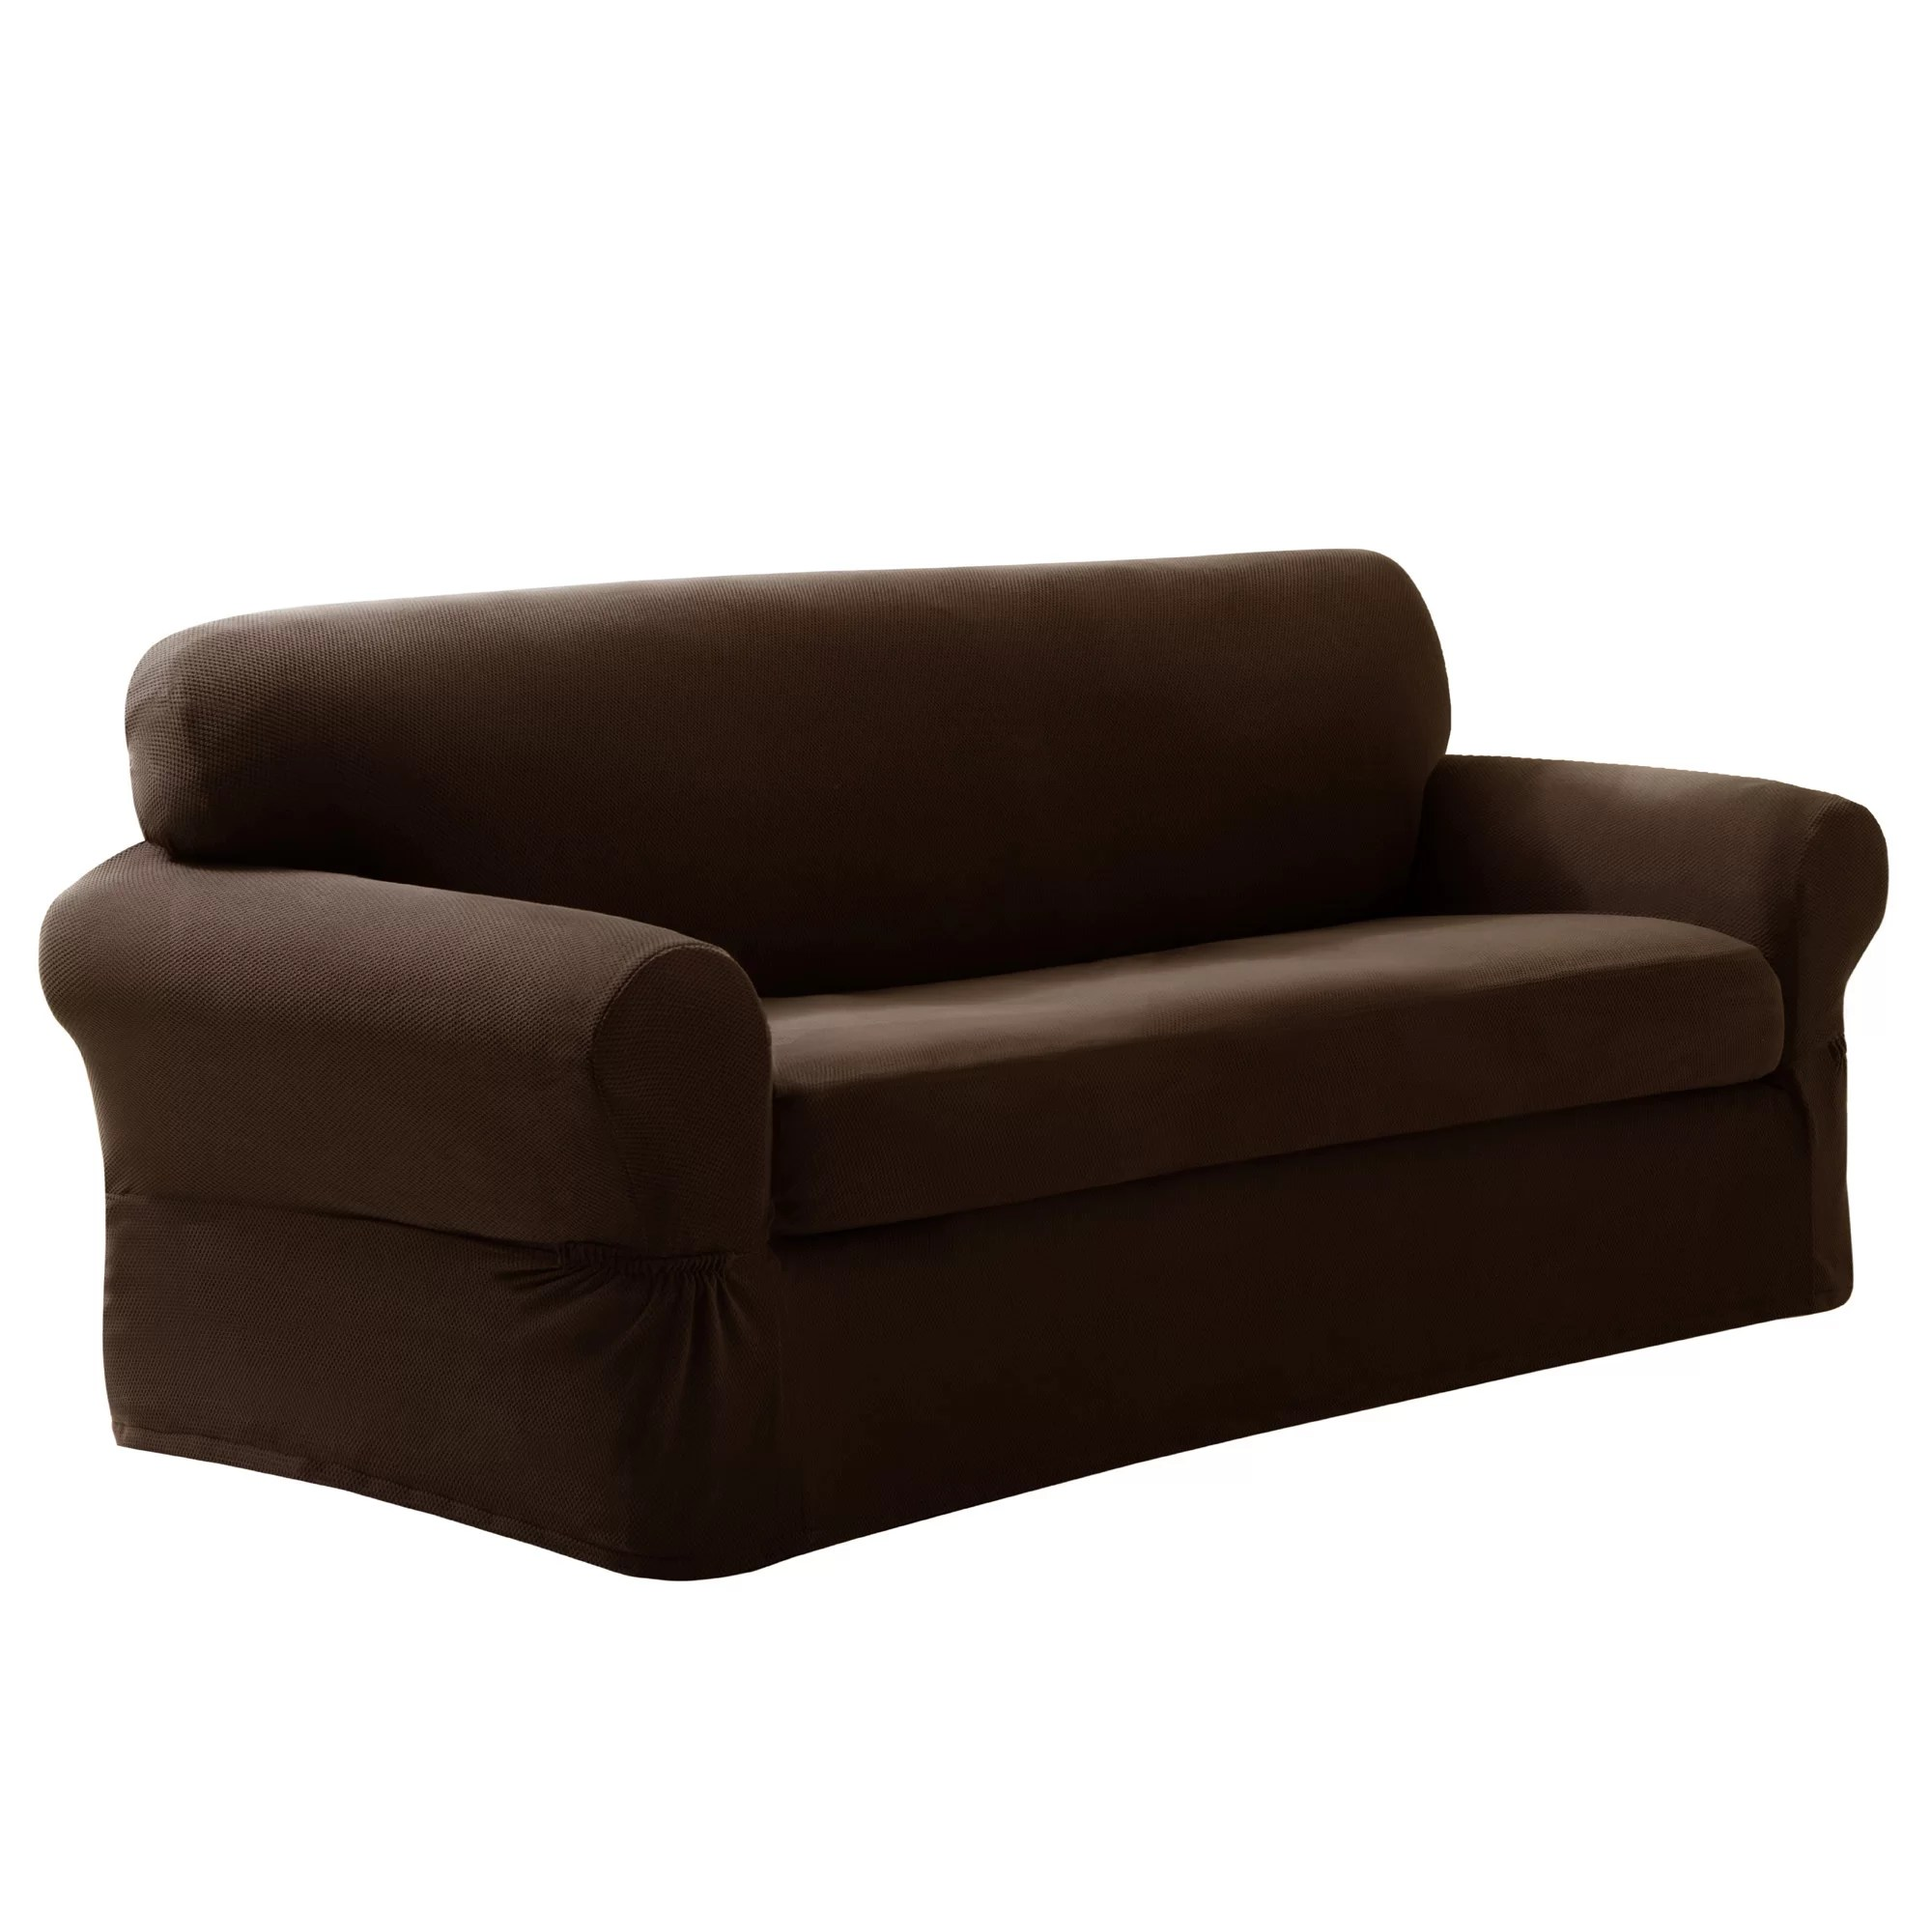 two cushion sofa slipcover high table maytex pixel stretch 2 piece box